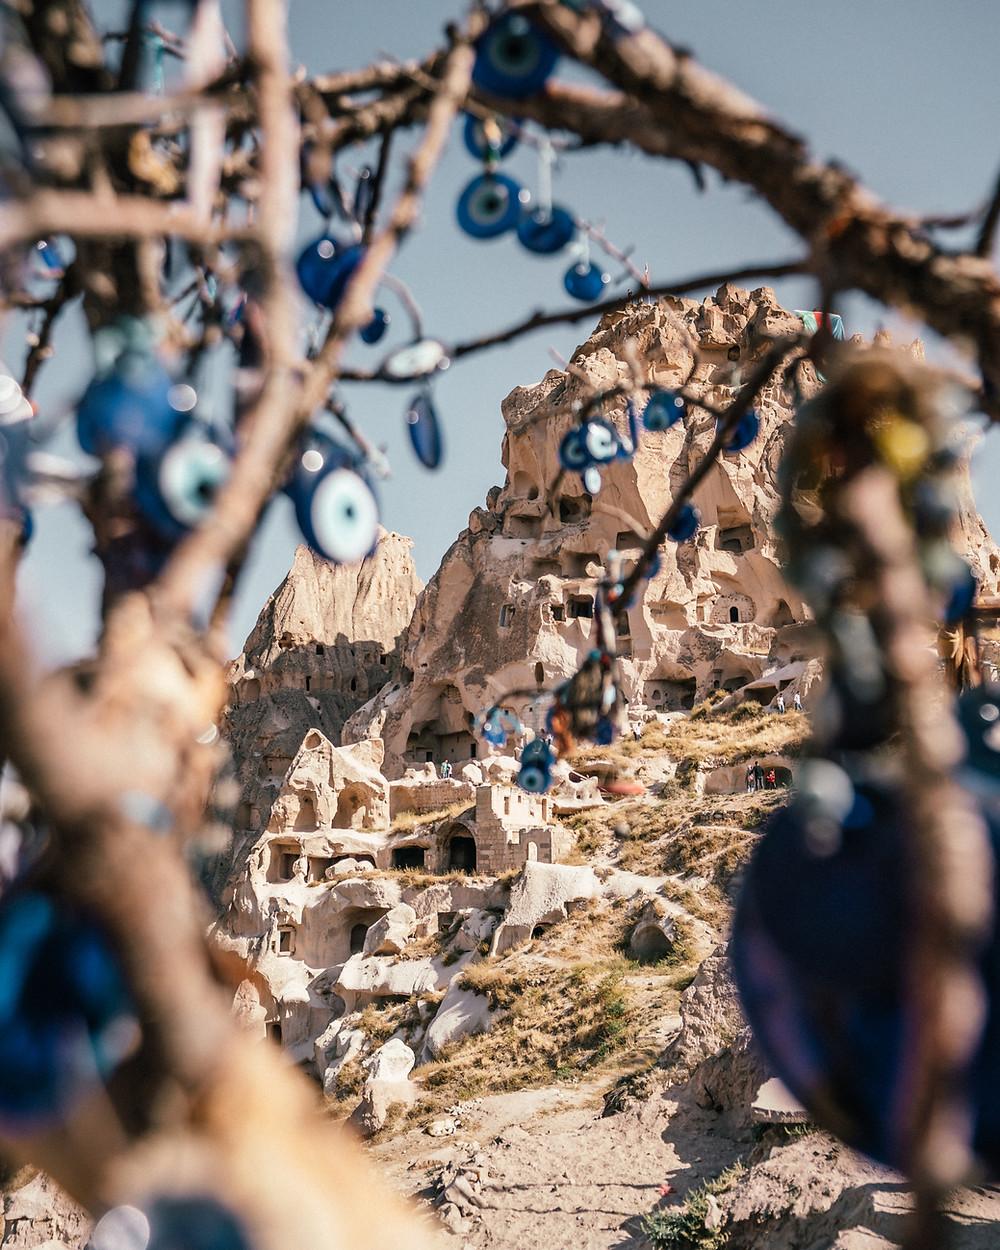 Uxhisar Castle, Cappadocia, Turkey